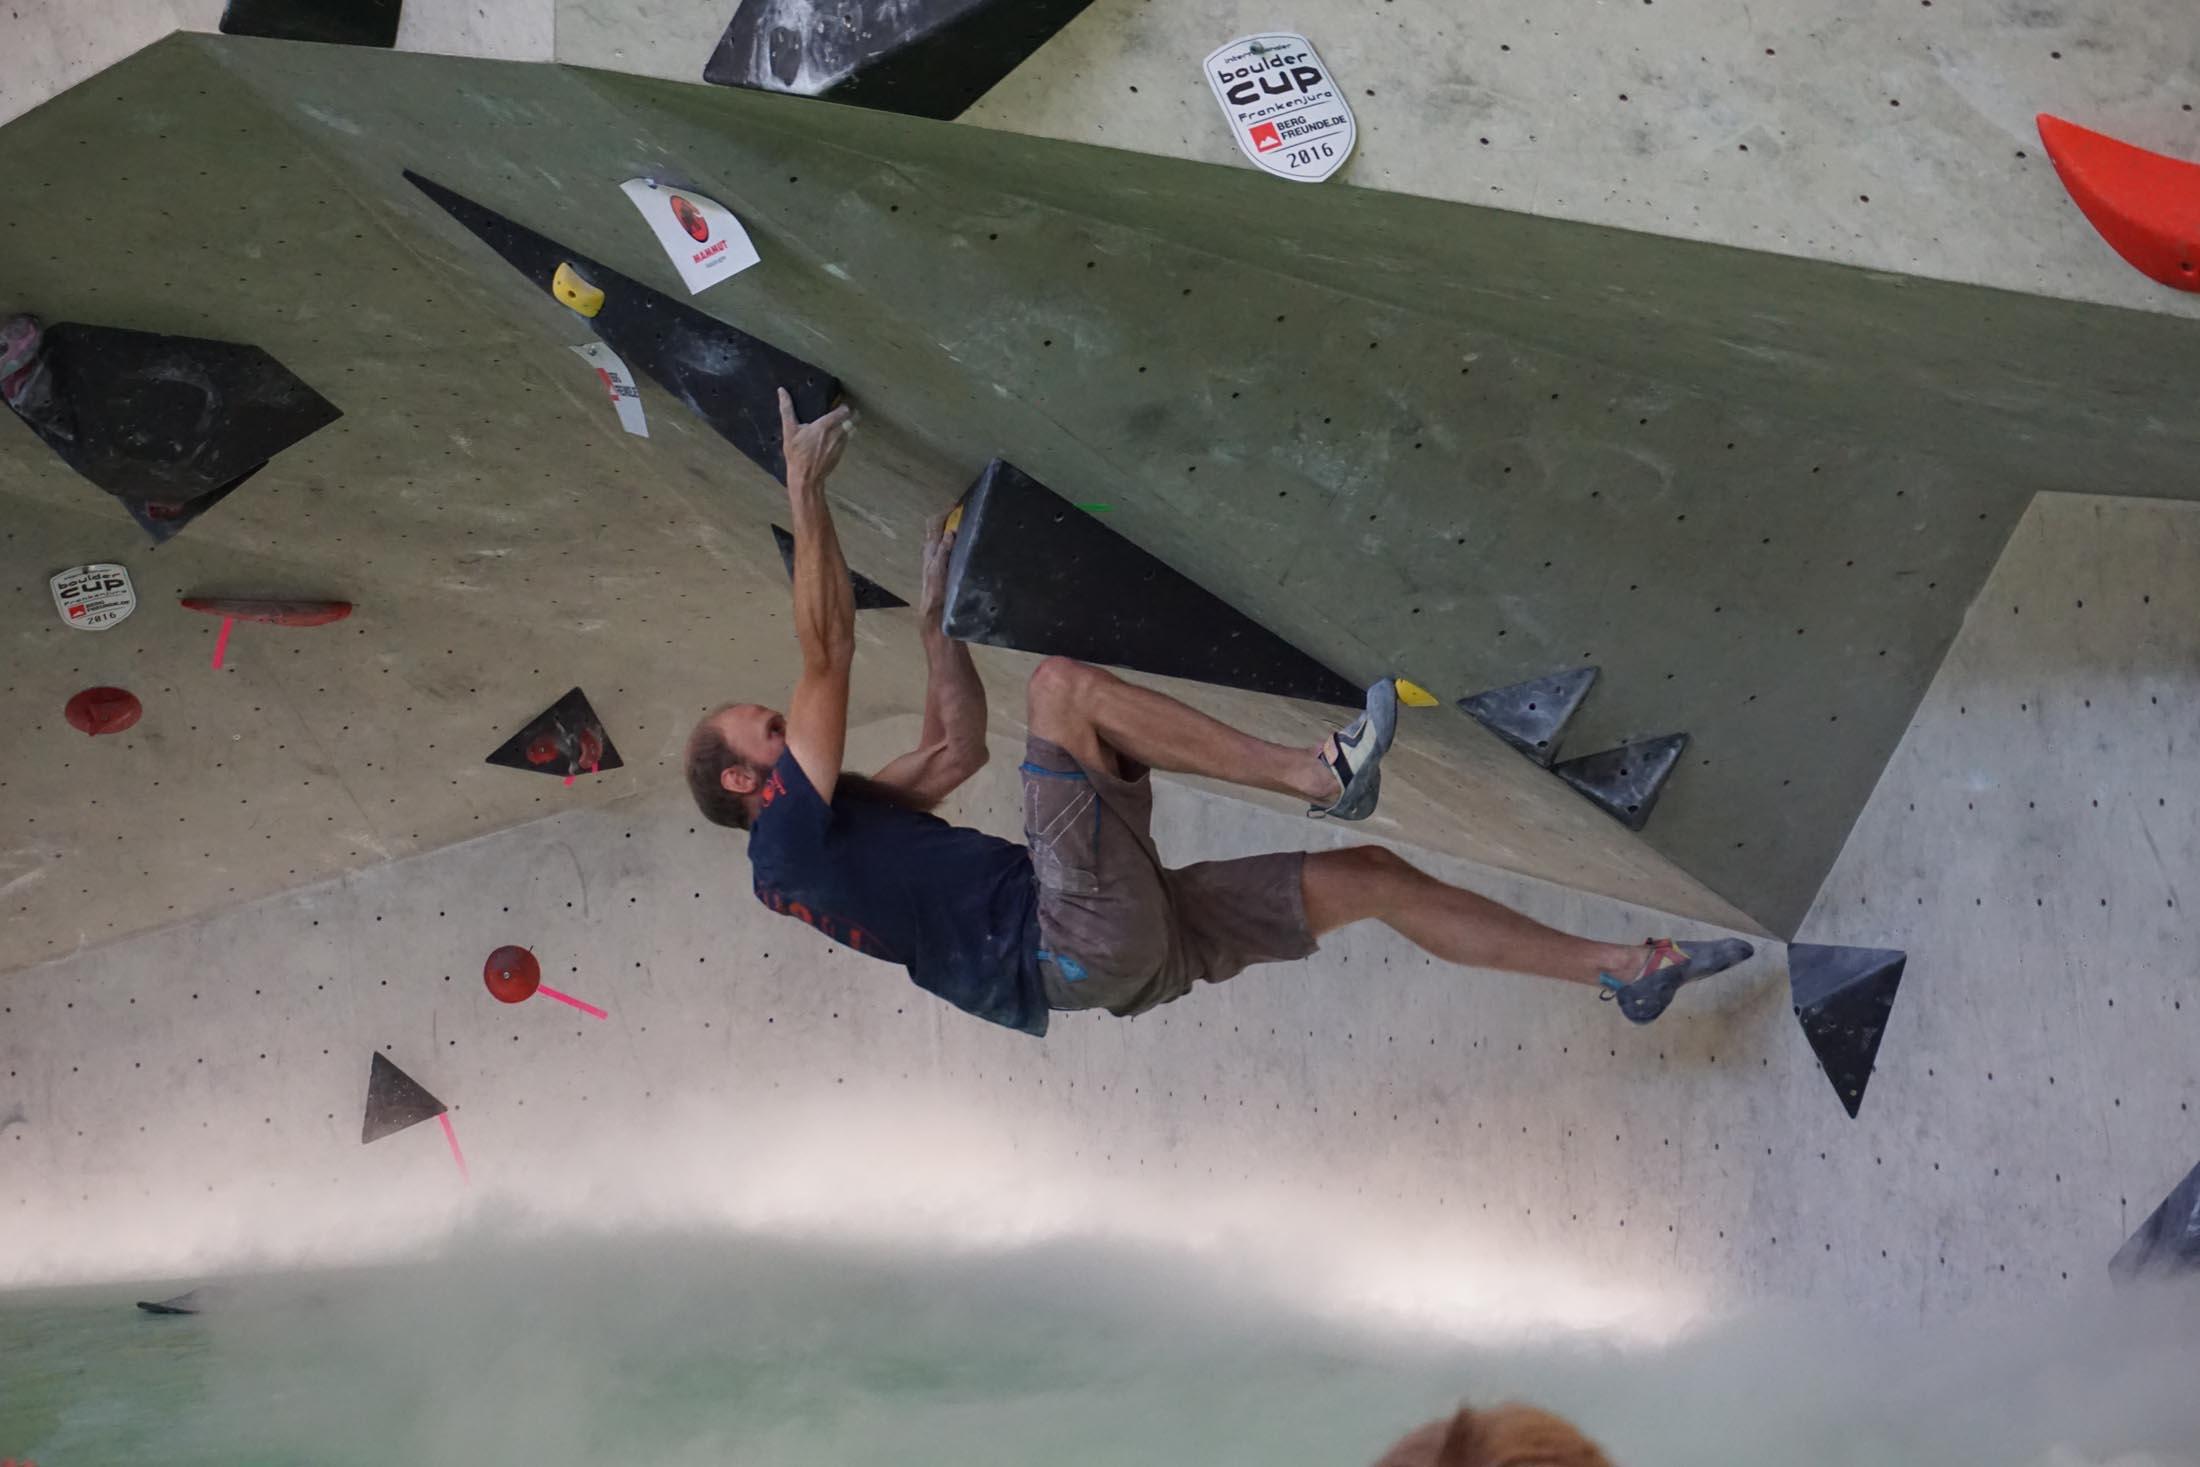 Finale, internationaler bouldercup Frankenjura 2016, BLOCKHELDEN Erlangen, Mammut, Bergfreunde.de, Boulderwettkampf07092016700